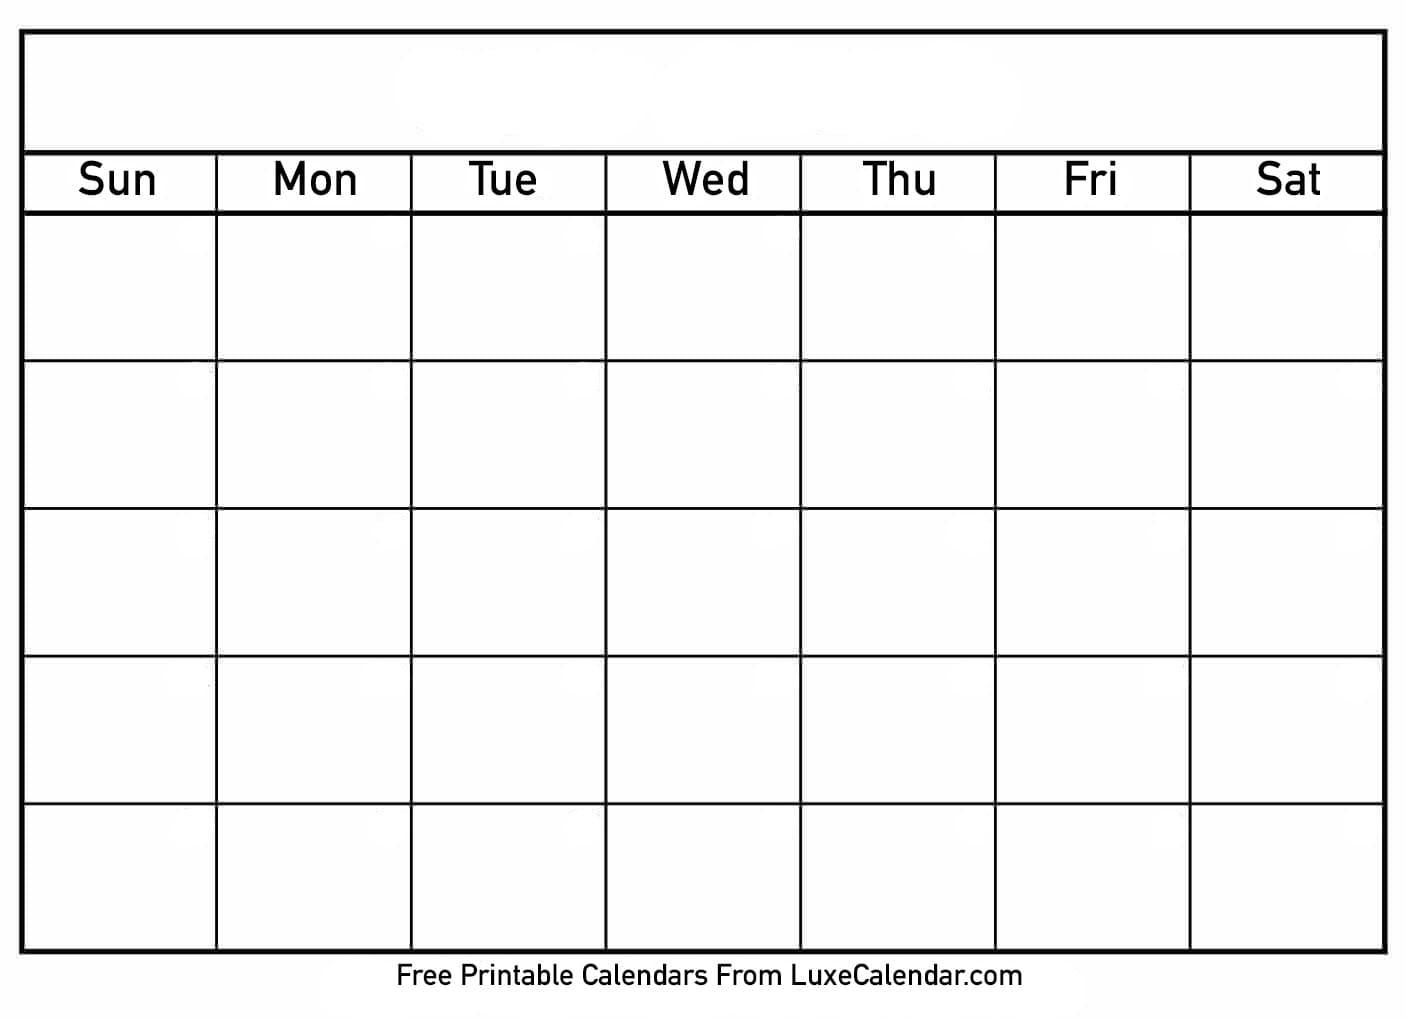 Blank Printable Calendar - Luxe Calendar with Free Printable Blank Calendars